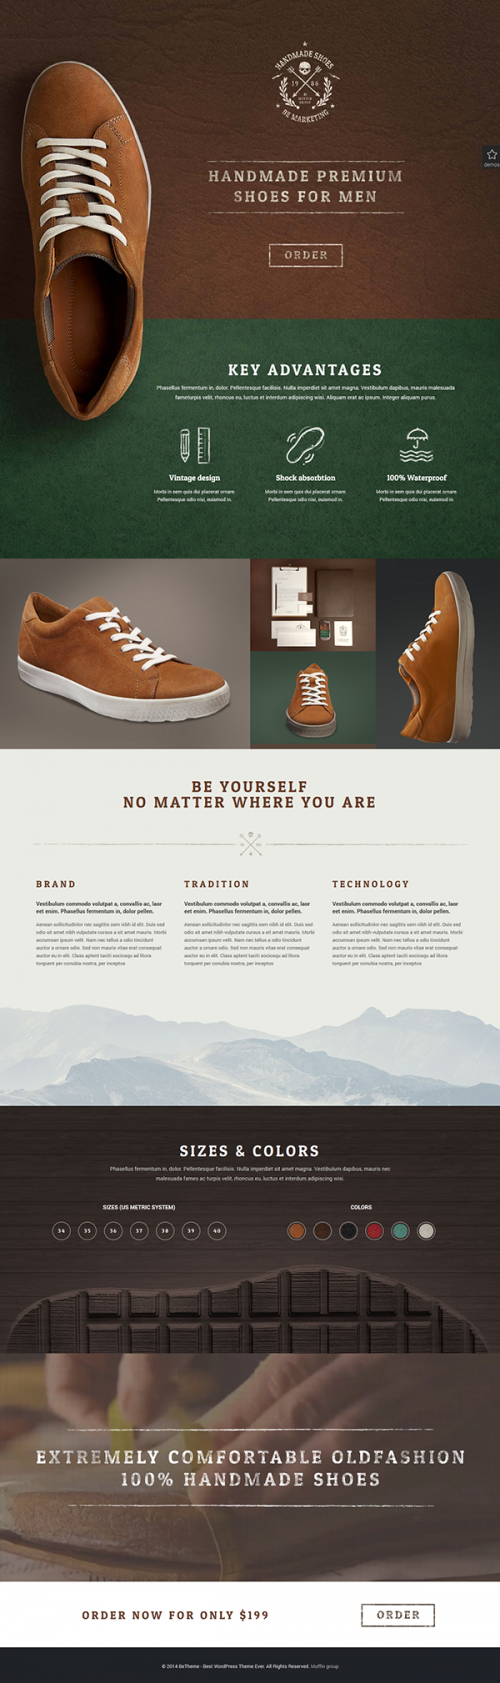 be-theme-handmade-shoes